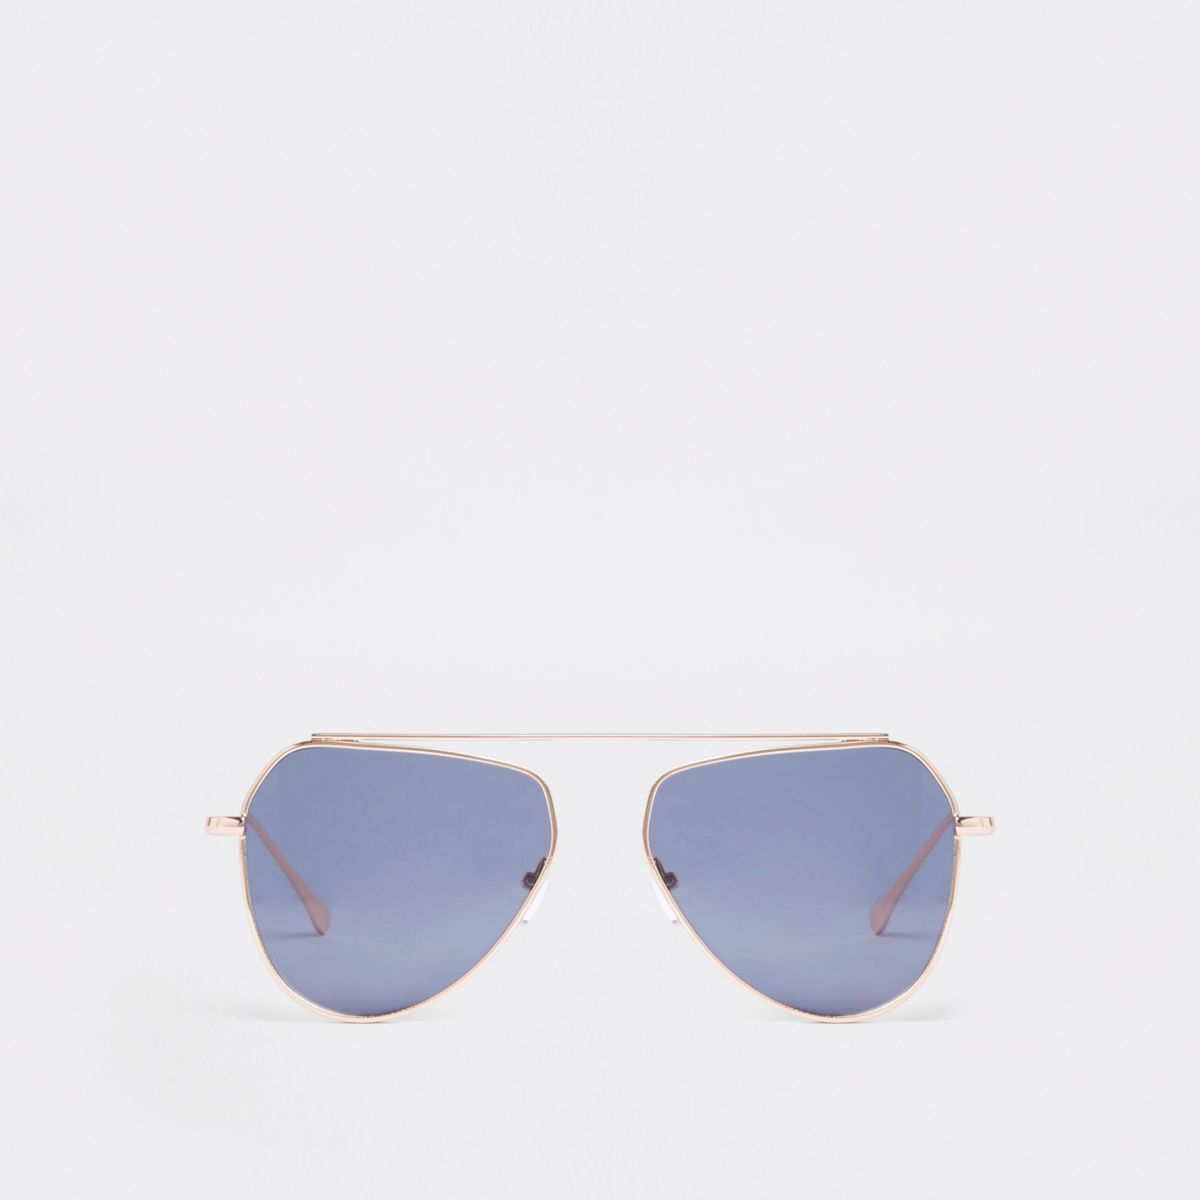 Gold tone aviator style sunglasses